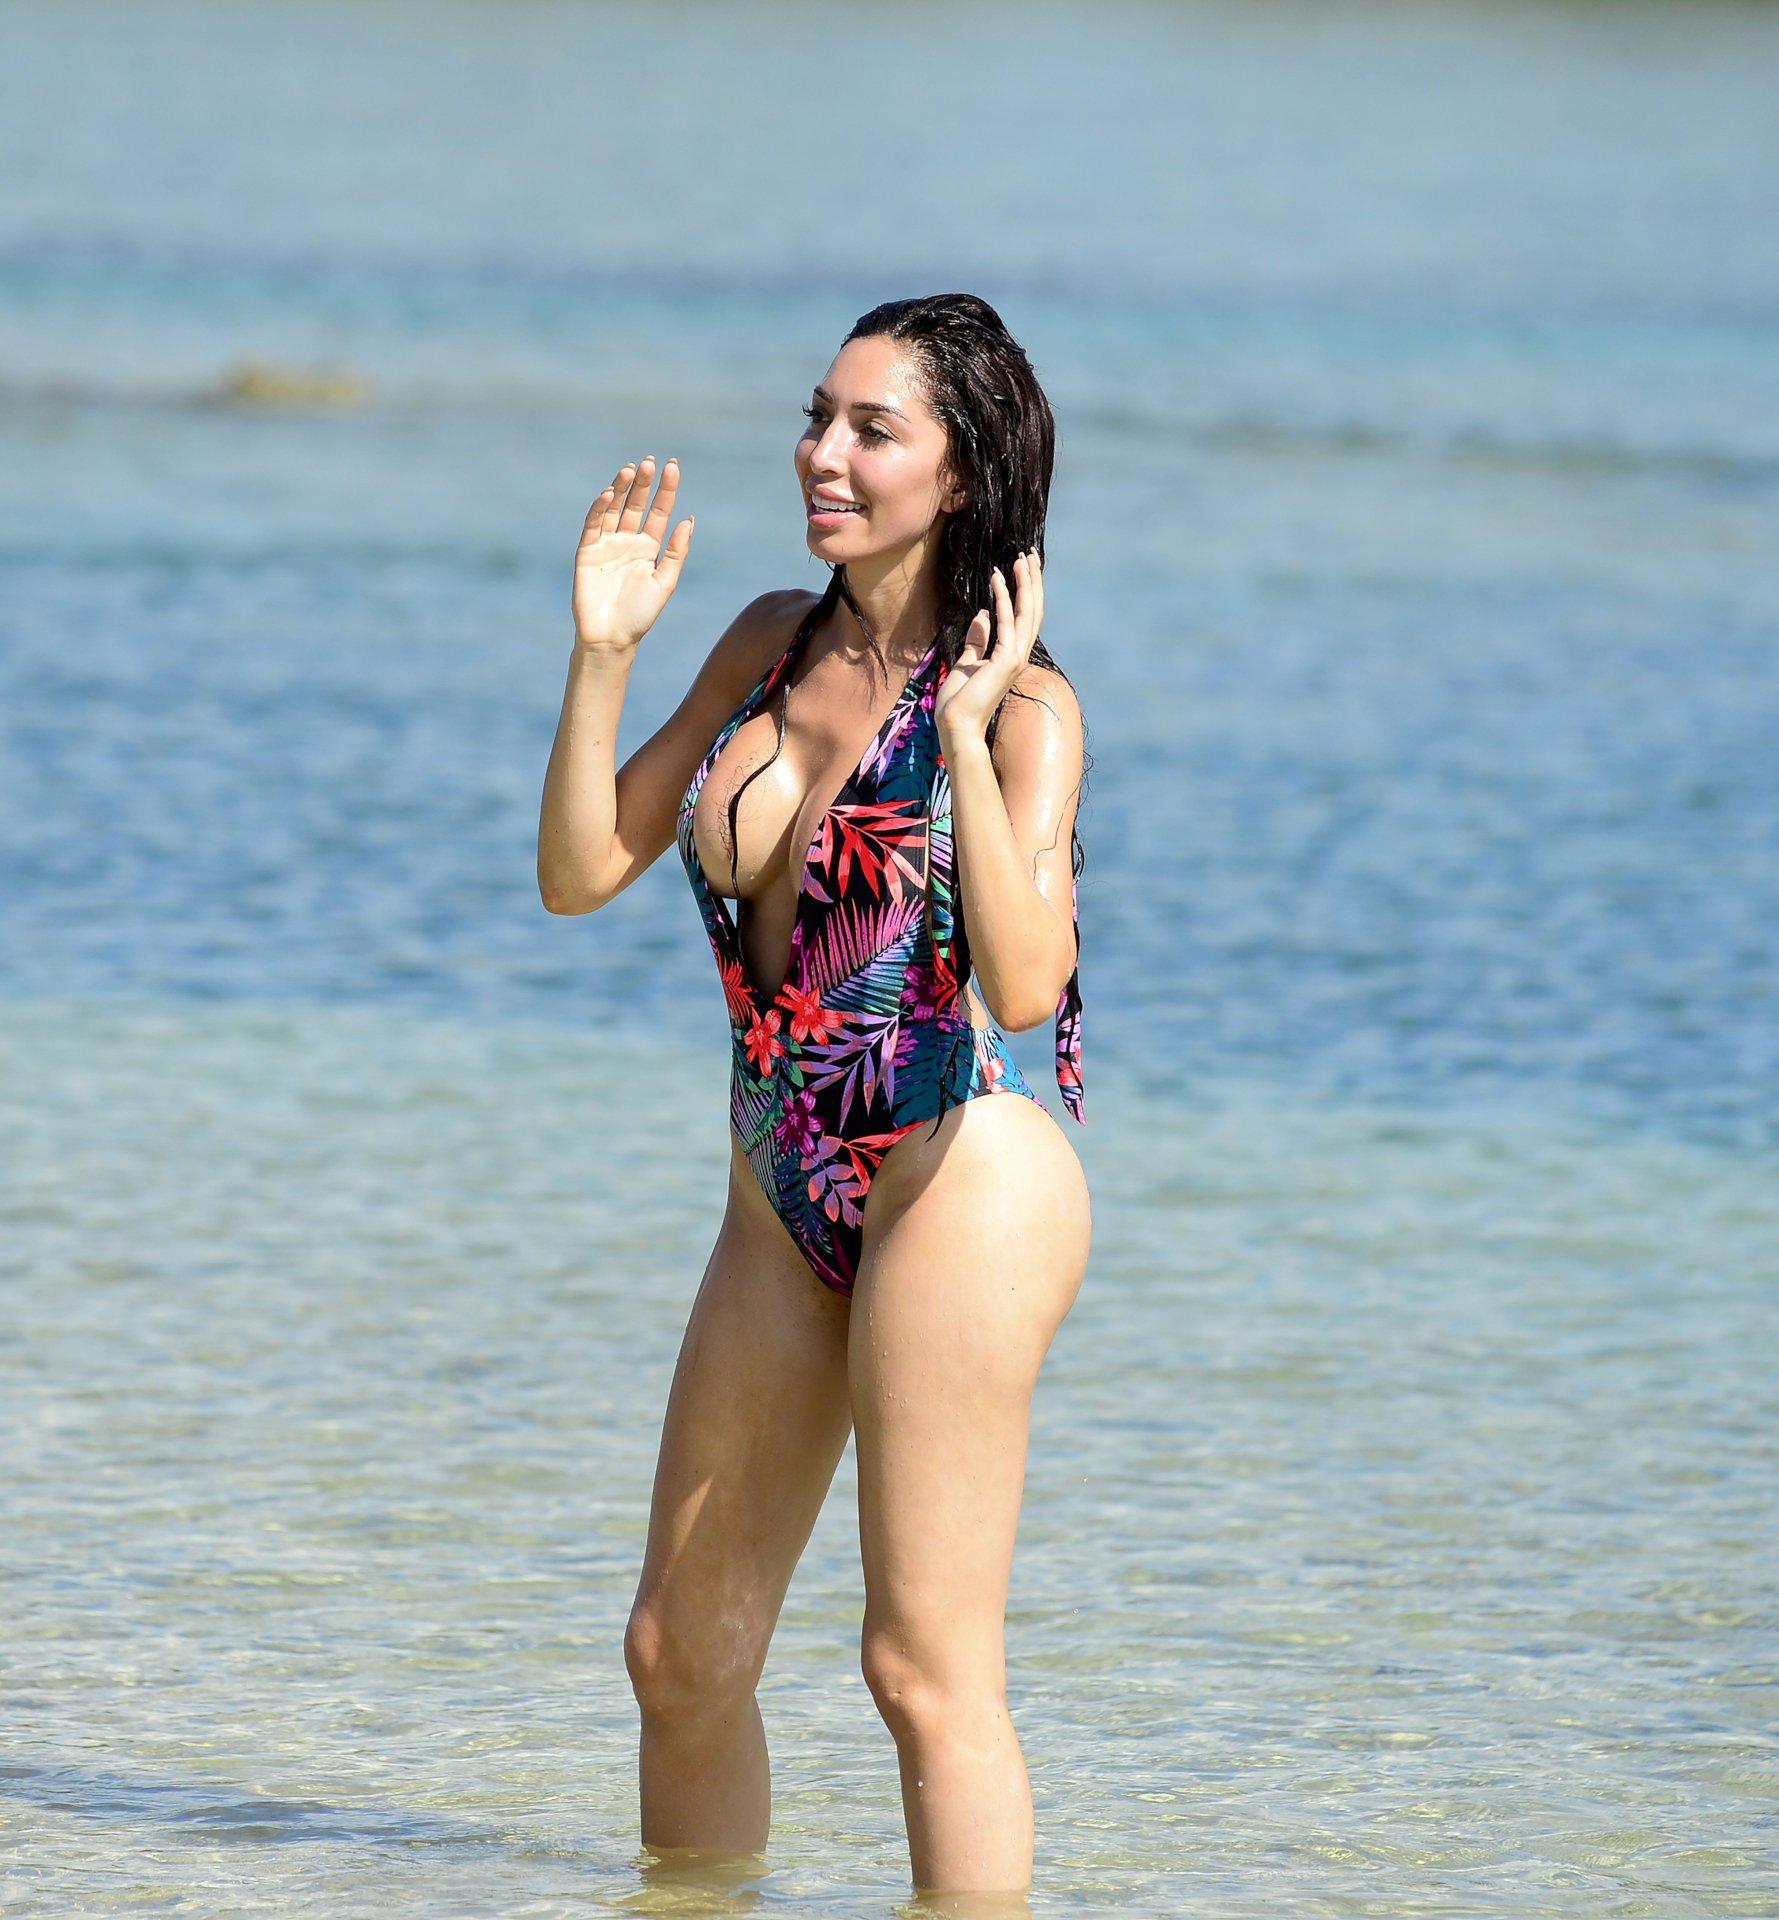 Farrah abraham boob slip nudes (23 photo), Boobs Celebrity pic